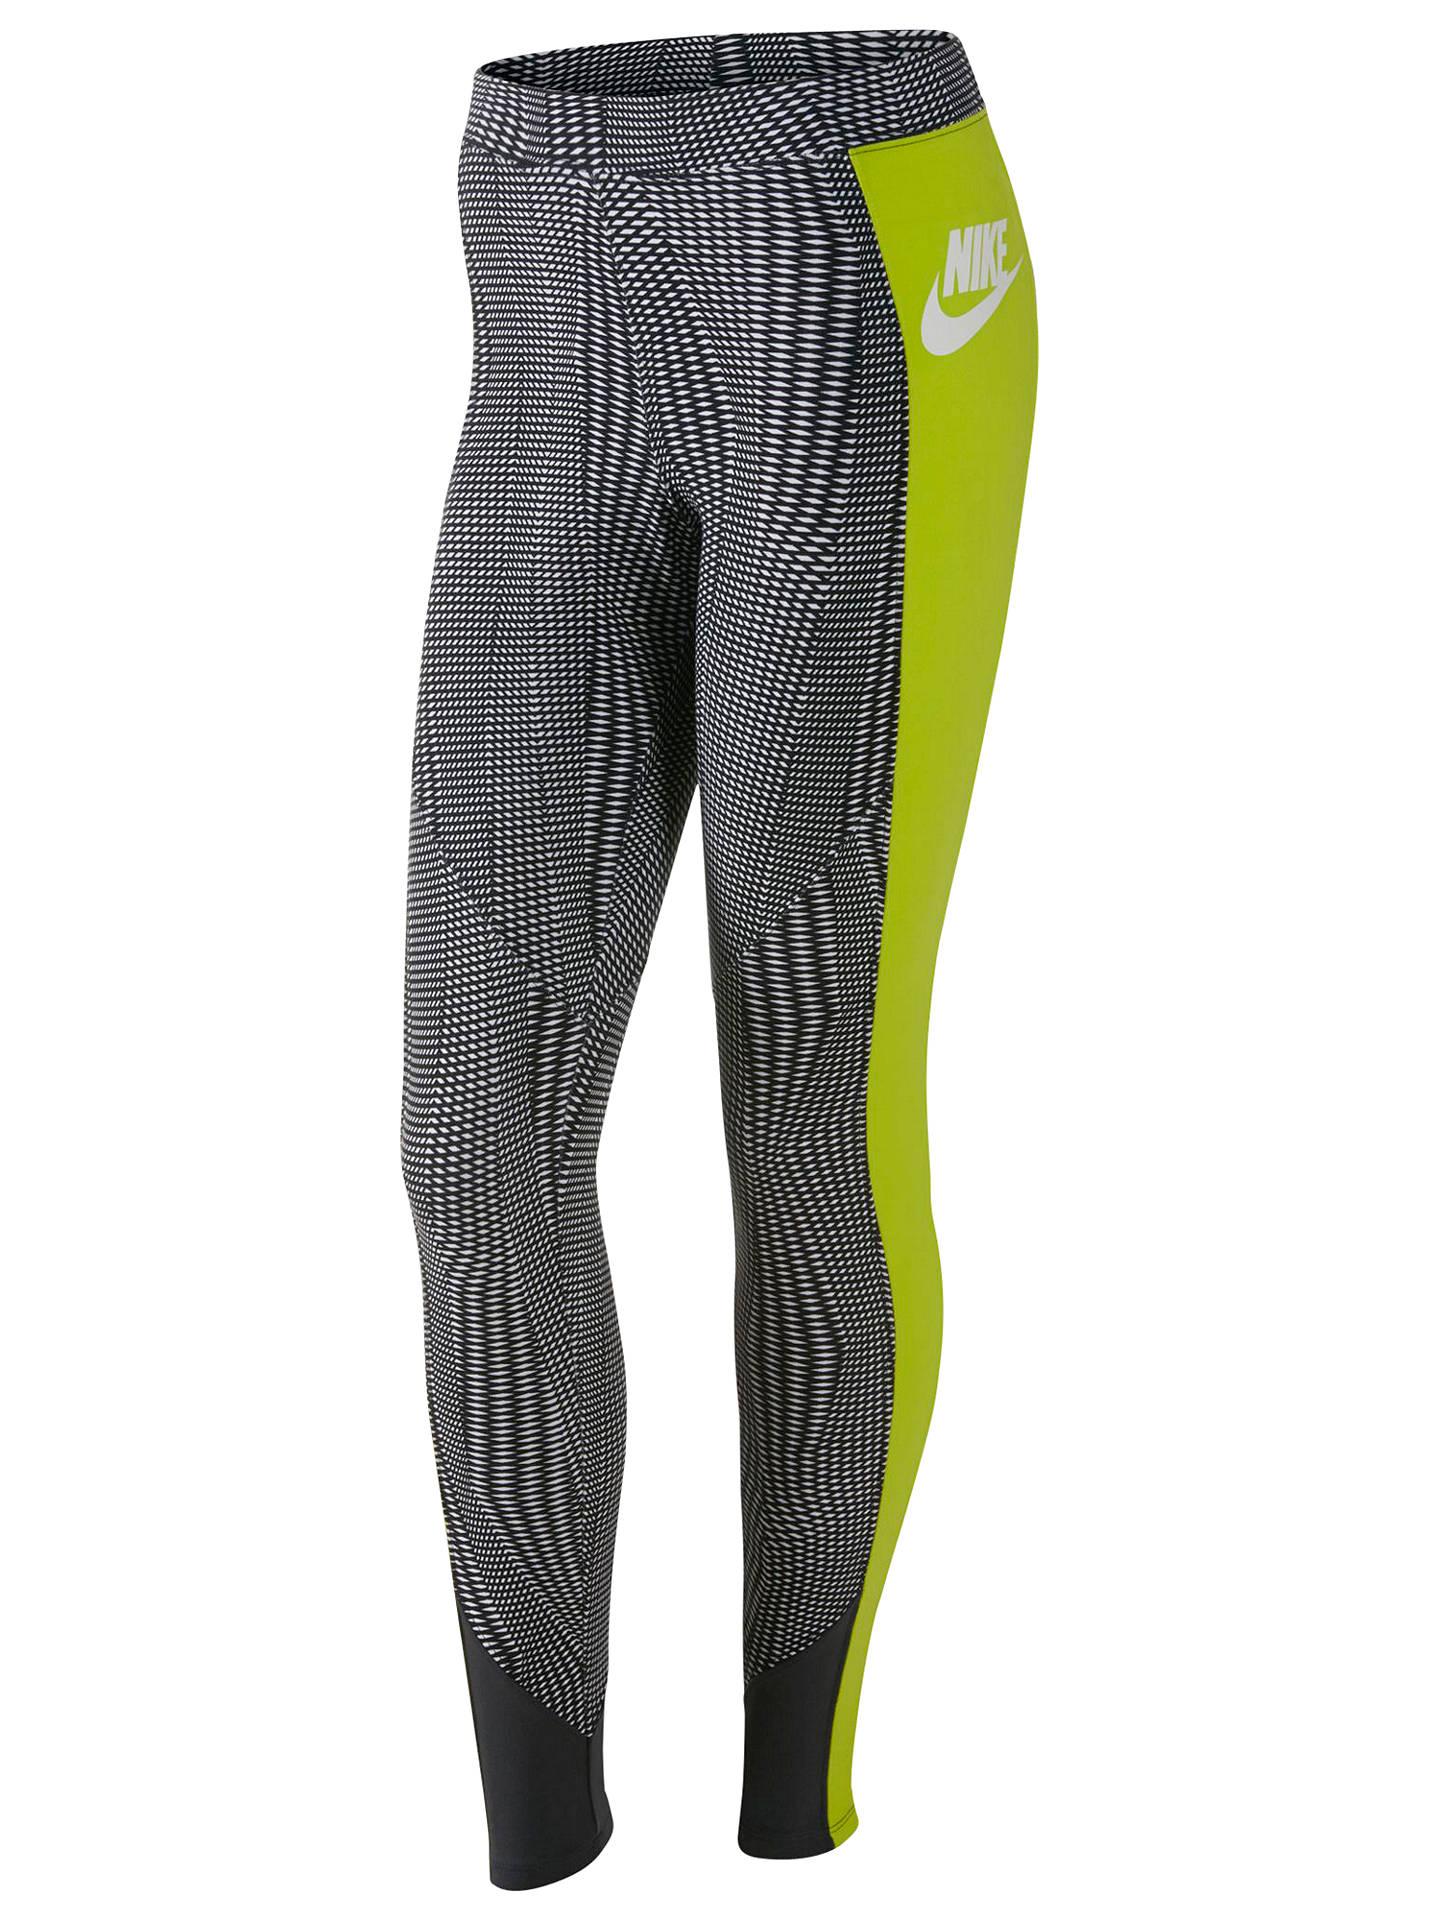 b3453f362a56 Buy Nike Ru Fly Leggings